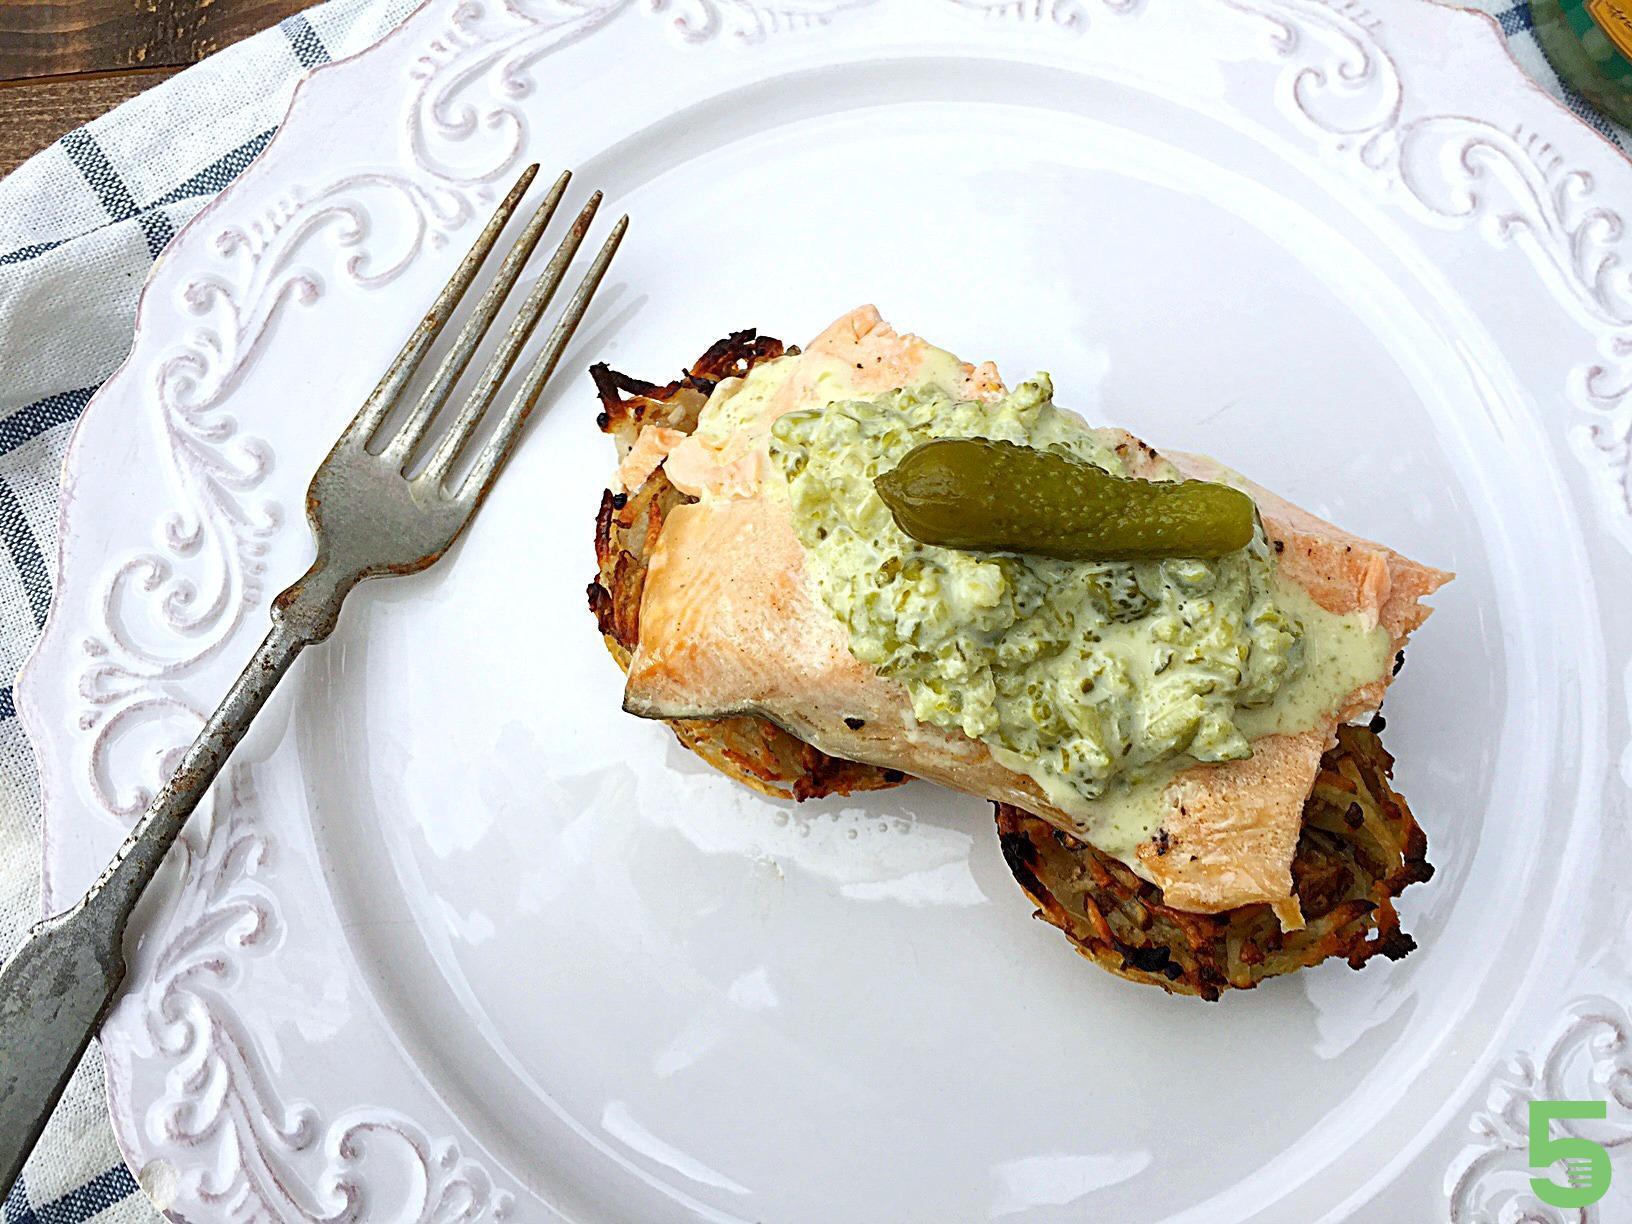 gateau-patate-cornichon-2